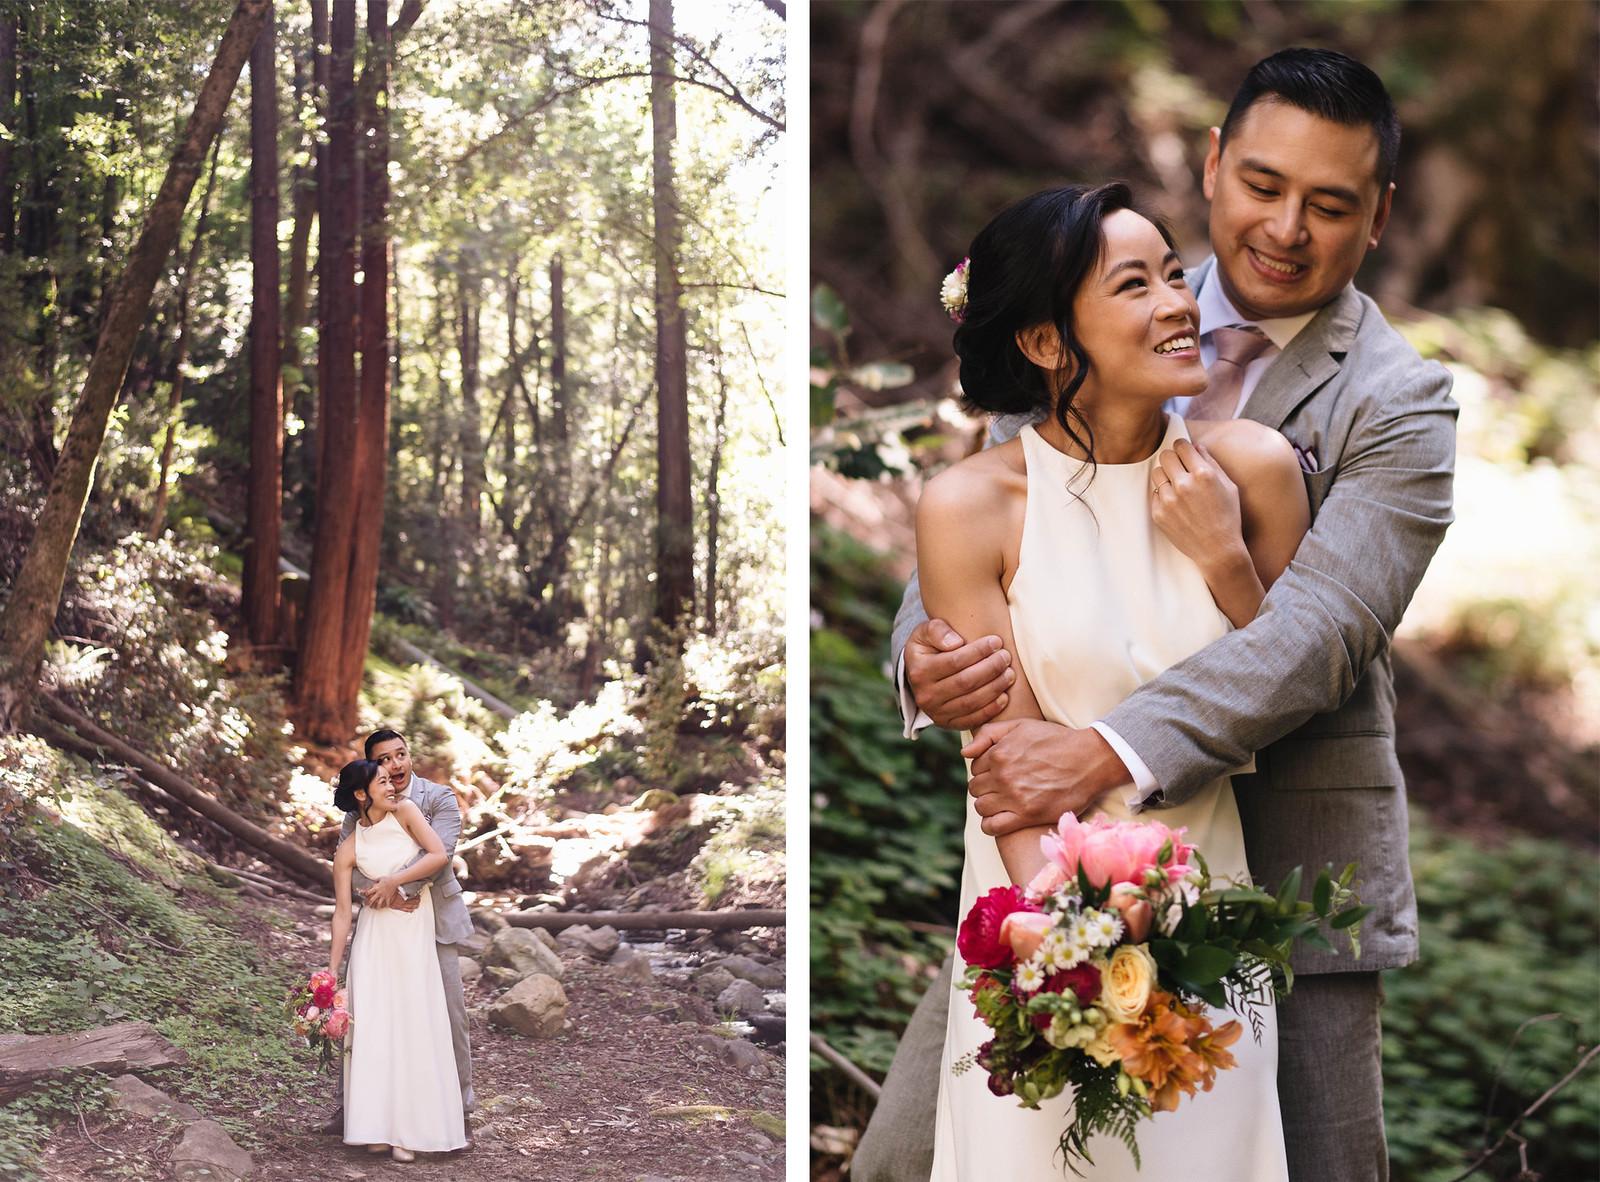 playful-northern-california-wedding=inspiration on juliettelaura.com